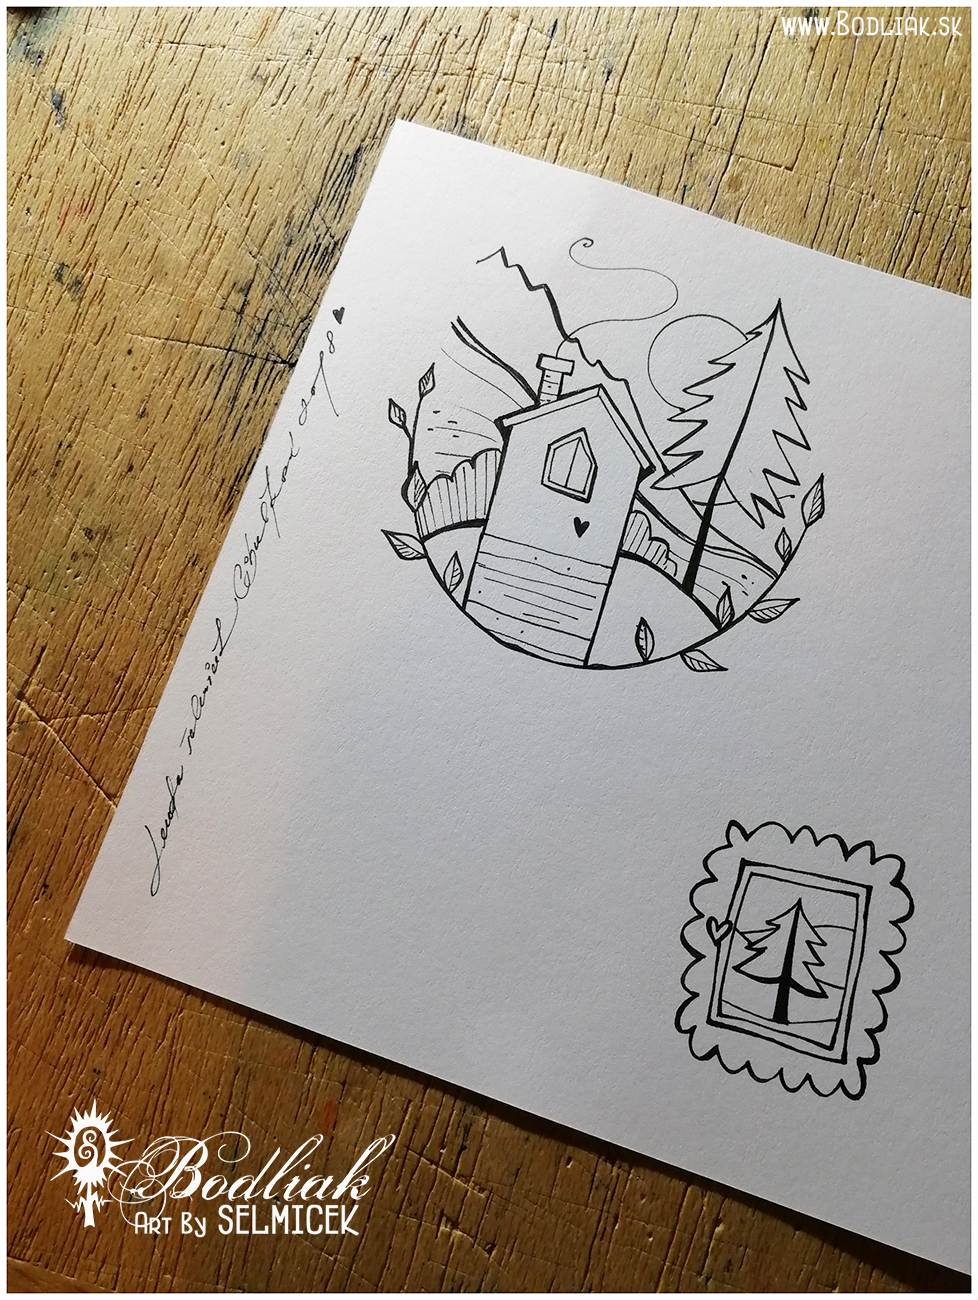 Domček a stromček   autor: Selmicek   domček : priemer kruhu - 7cm ...  stromček  - 3,5cm x 3,5cm